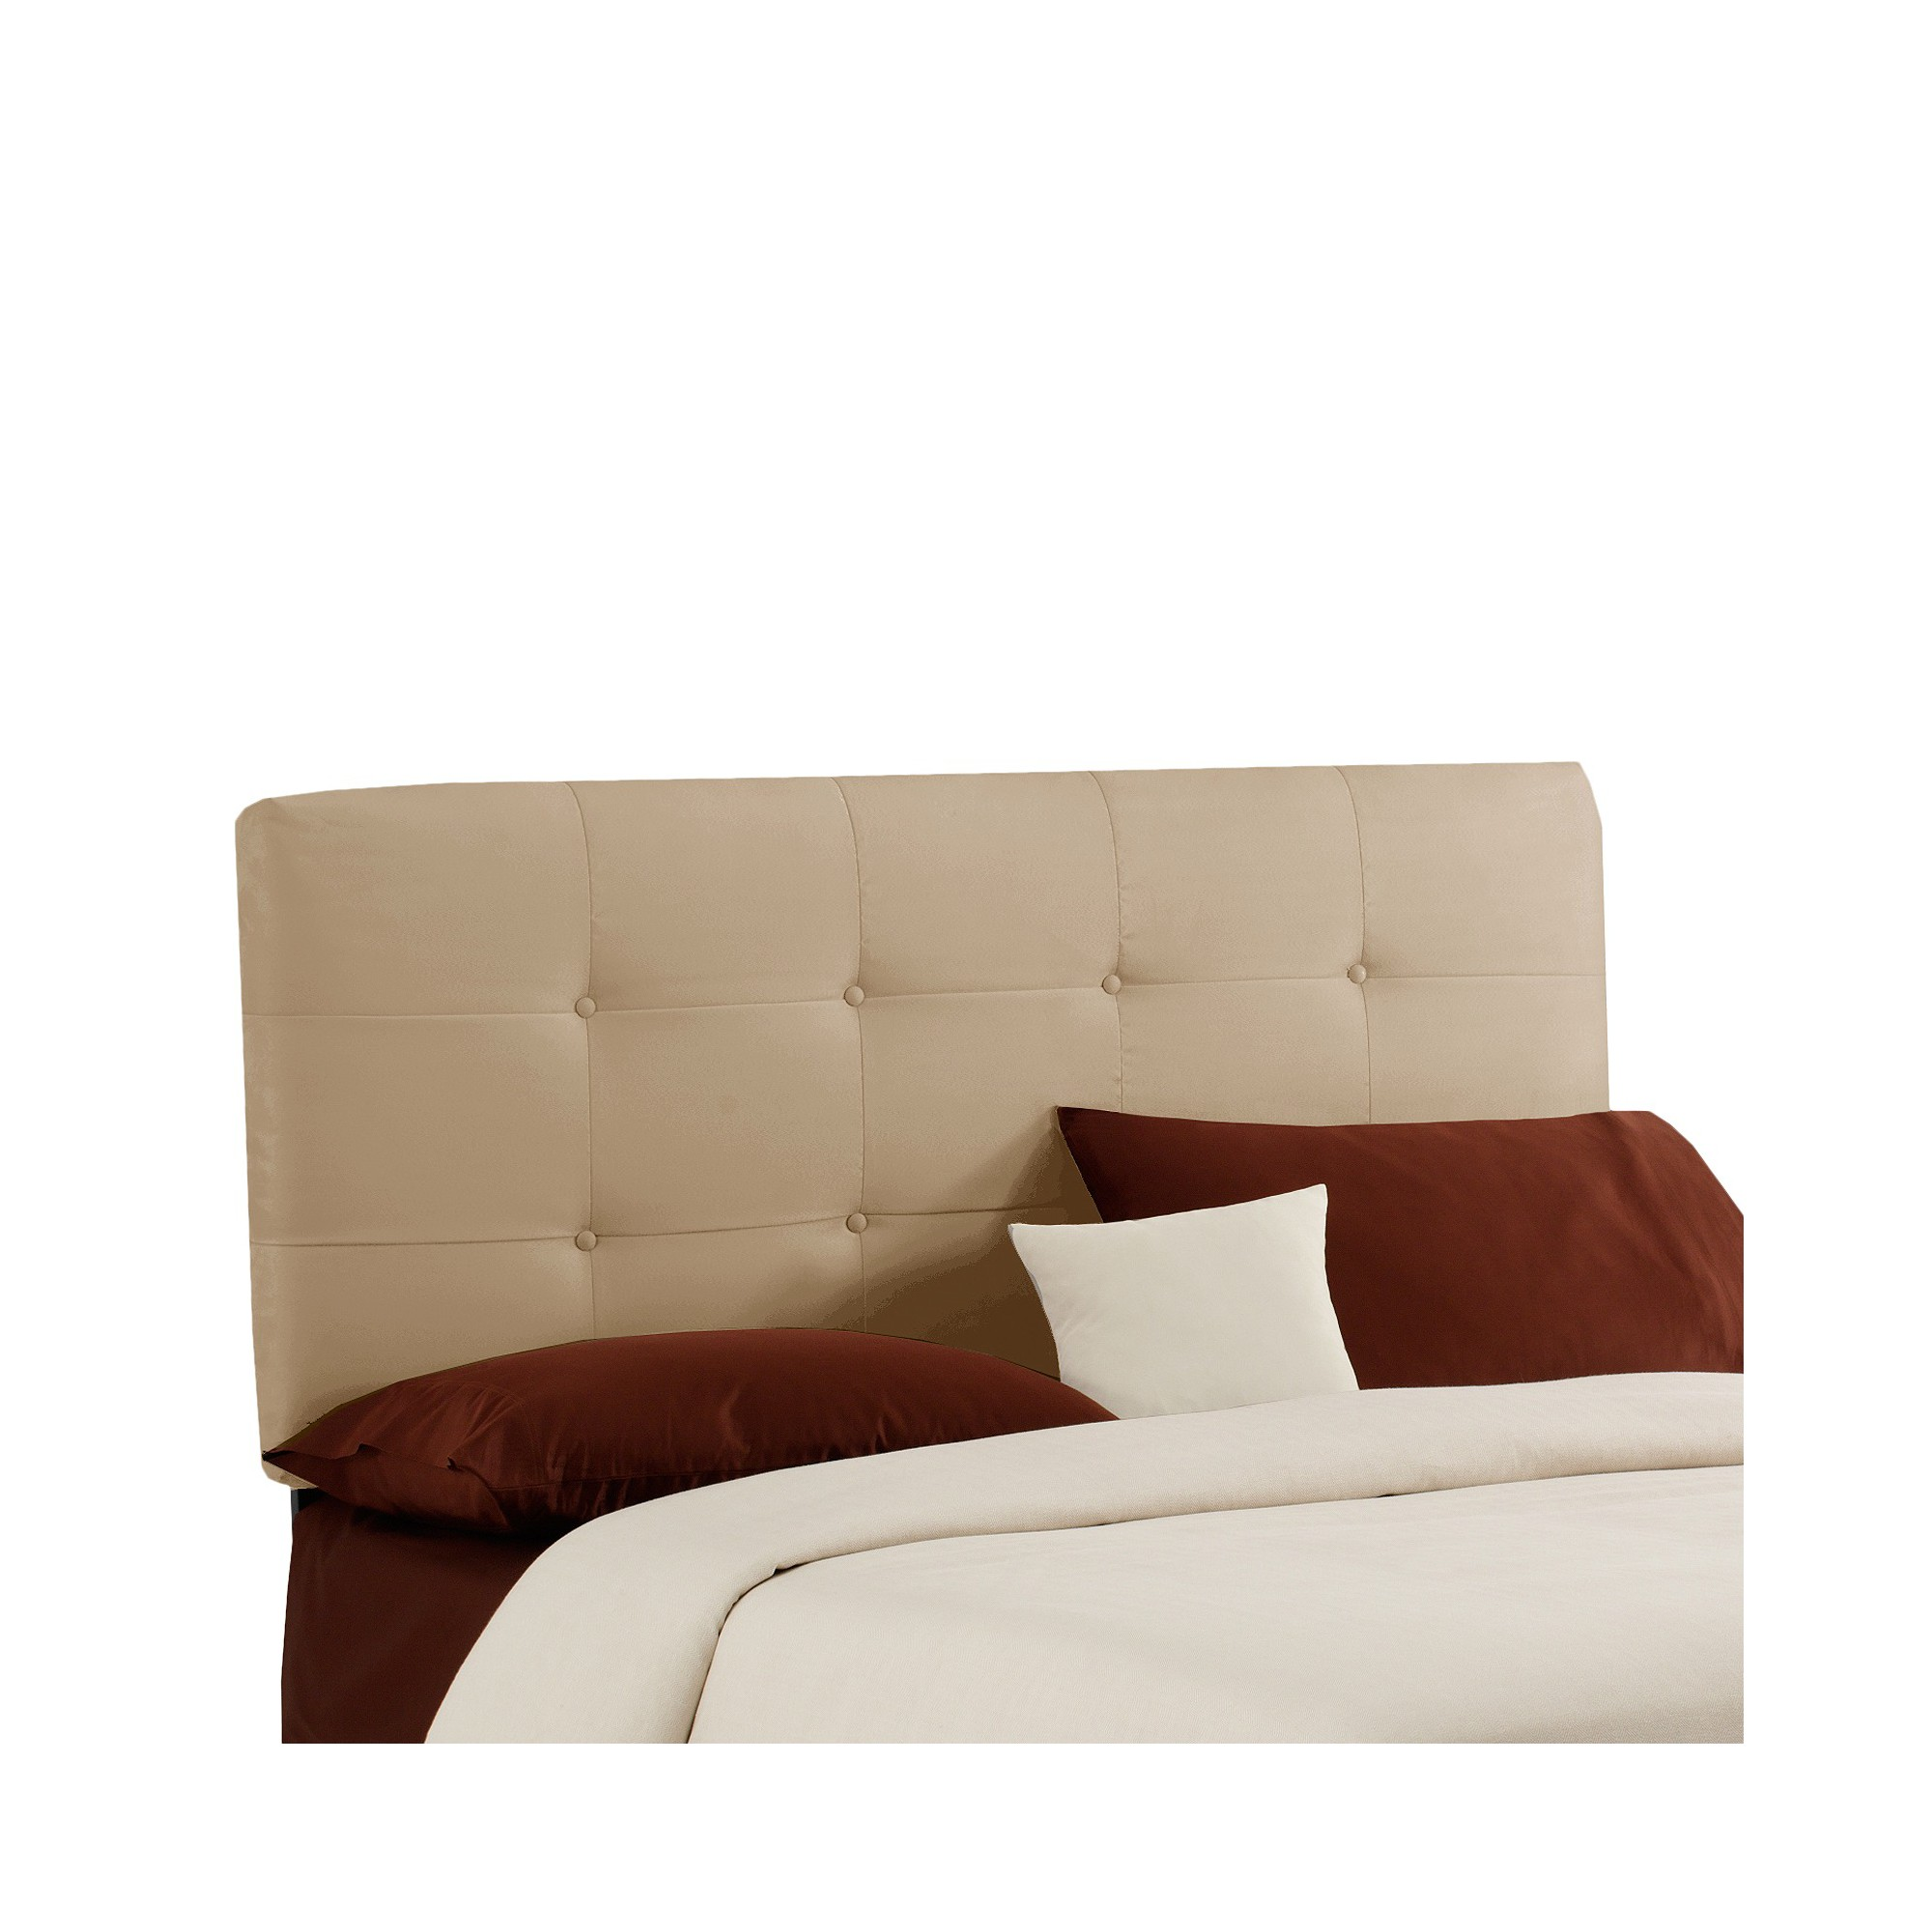 Dolce Microsuede Headboard - Premier Oatmeal - Full - Skyline Furniture